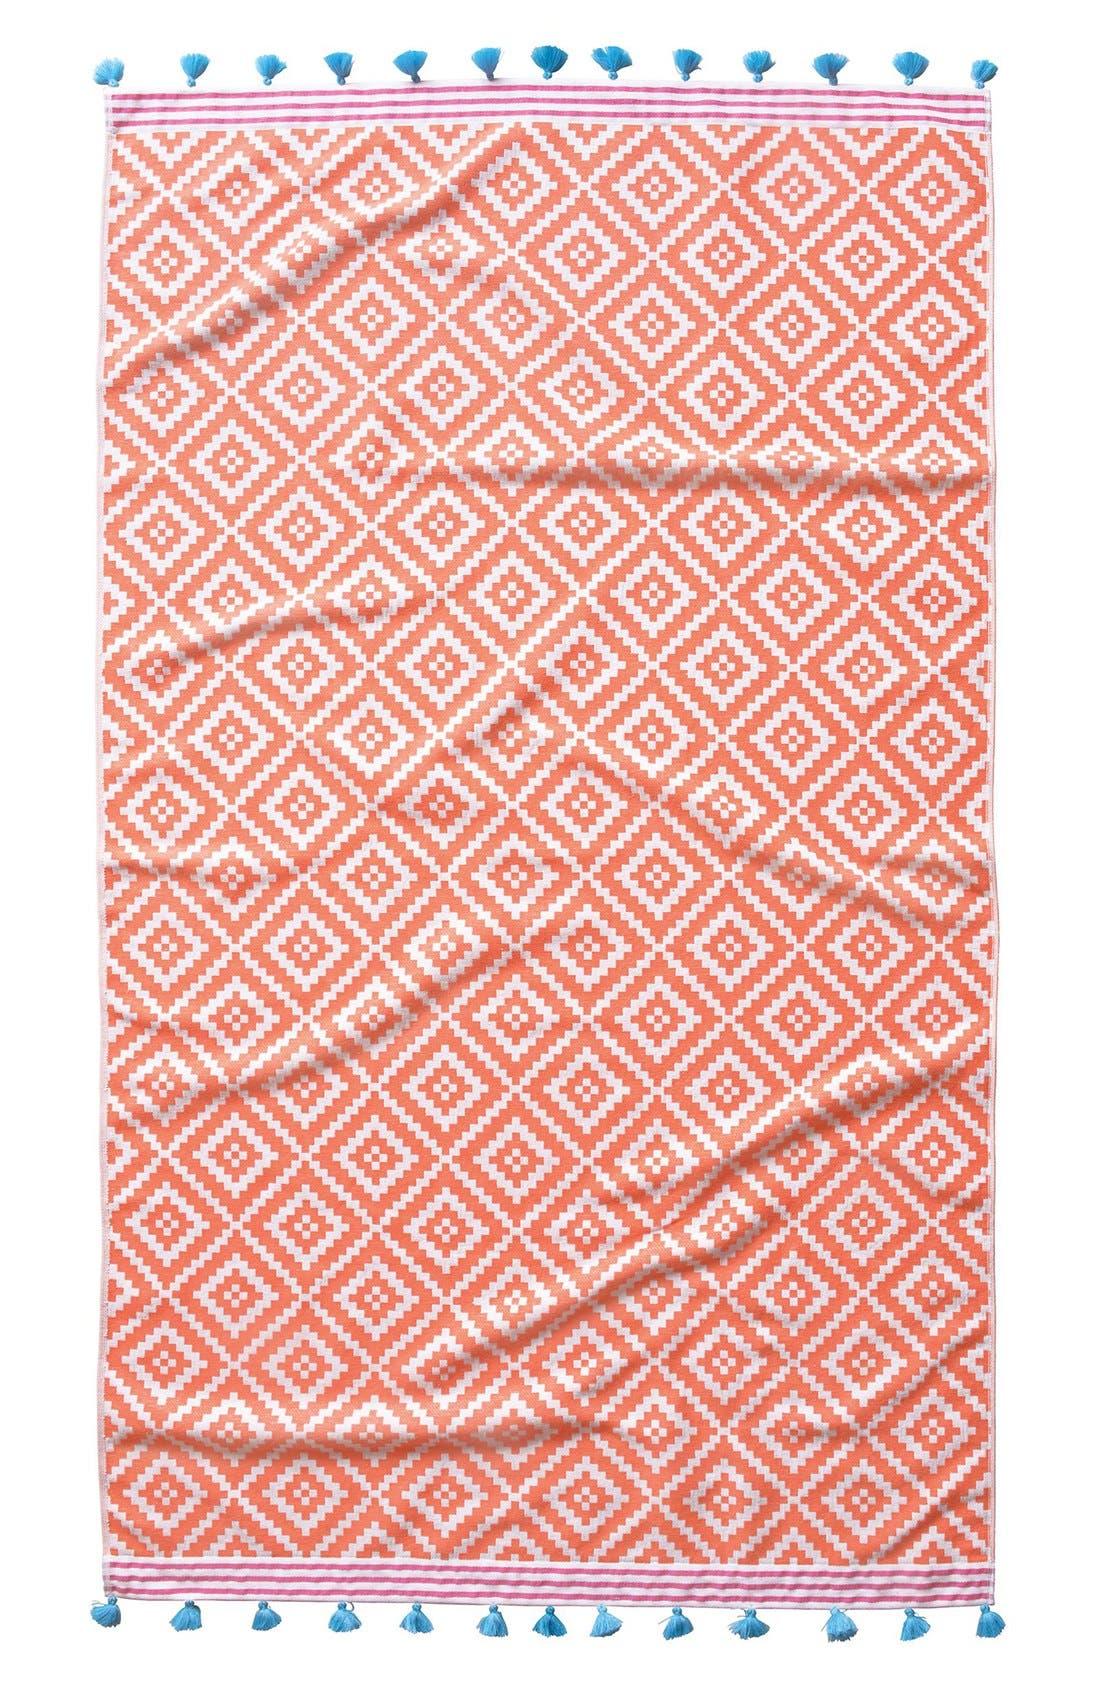 'Alabat' Beach Towel,                         Main,                         color, 950